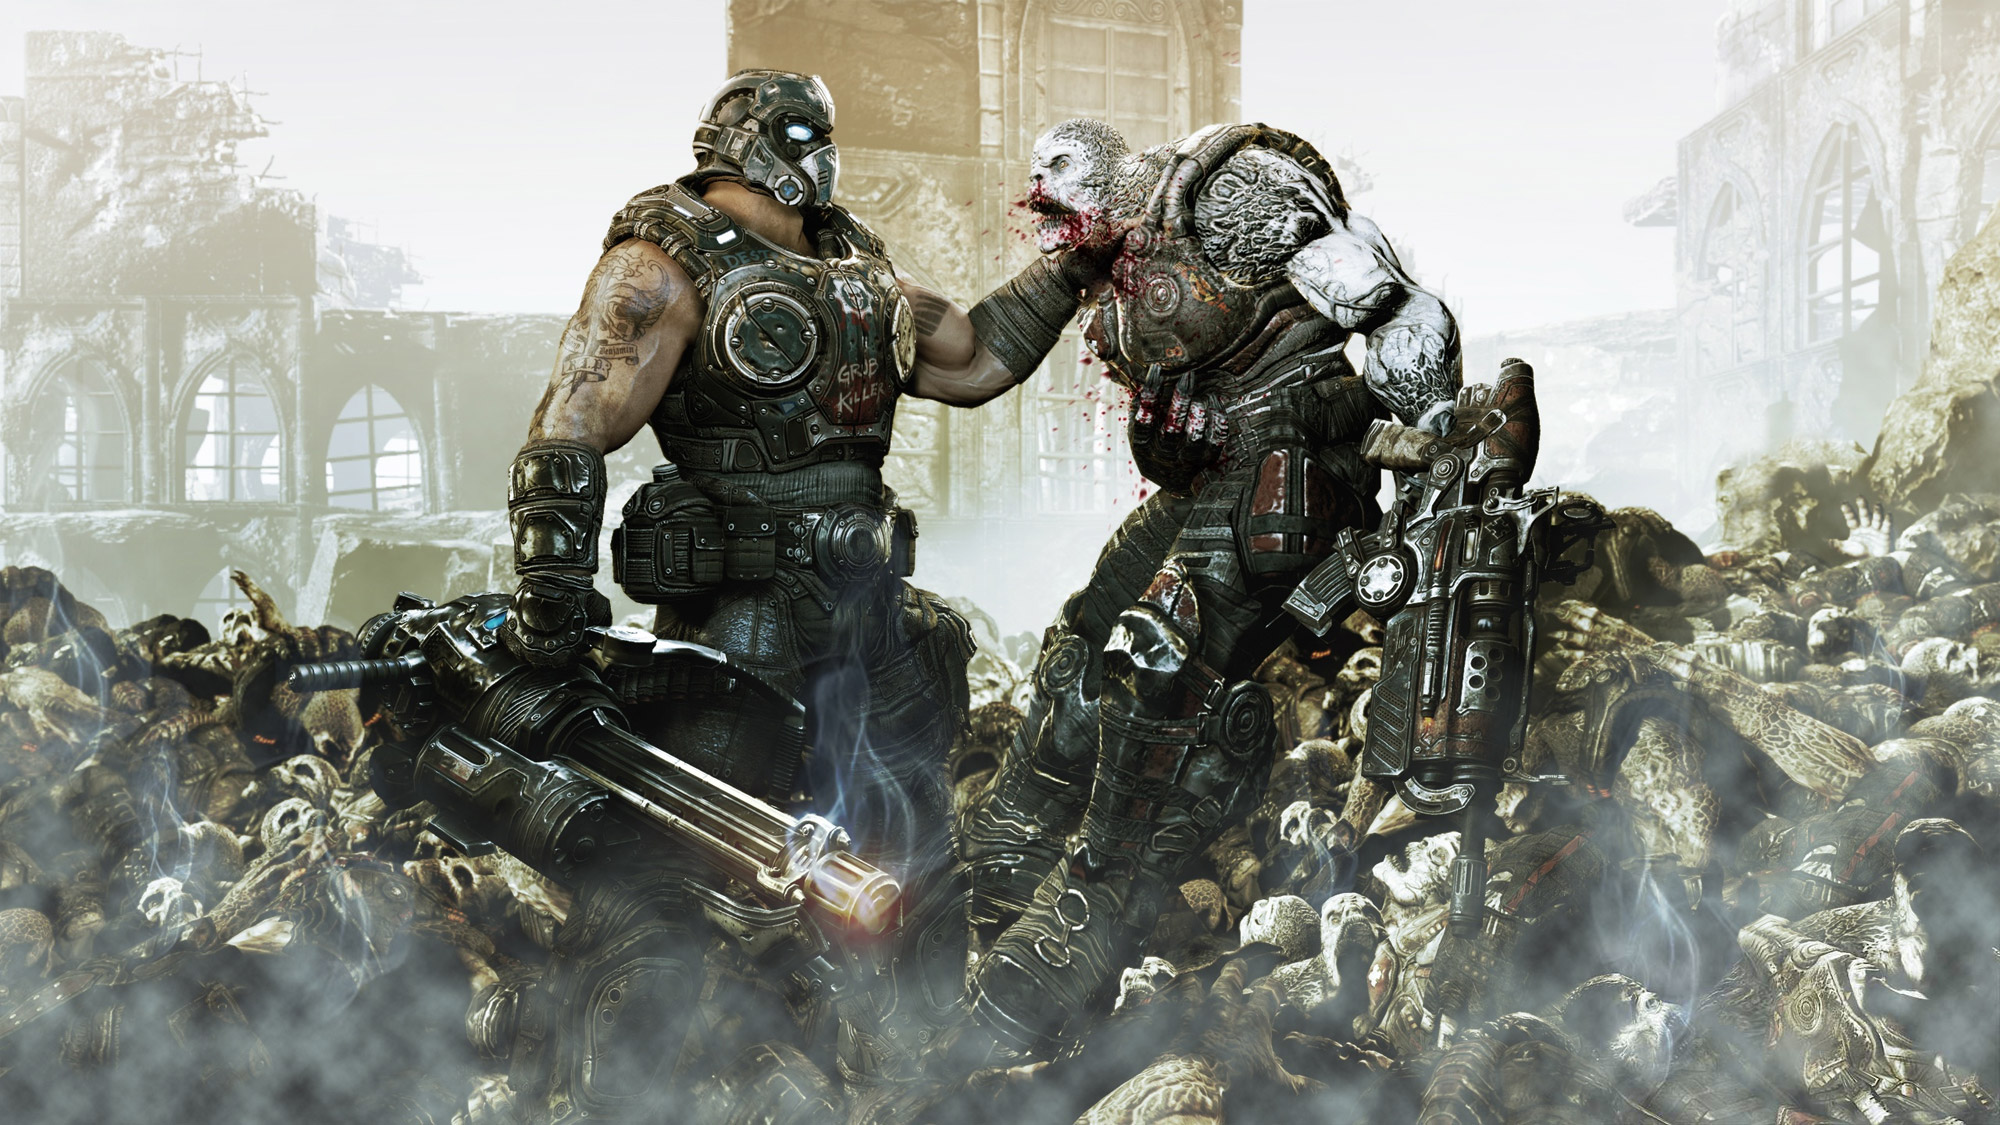 Description Gears of War 3 Wallpapers is a hi res Wallpaper for 2000x1125